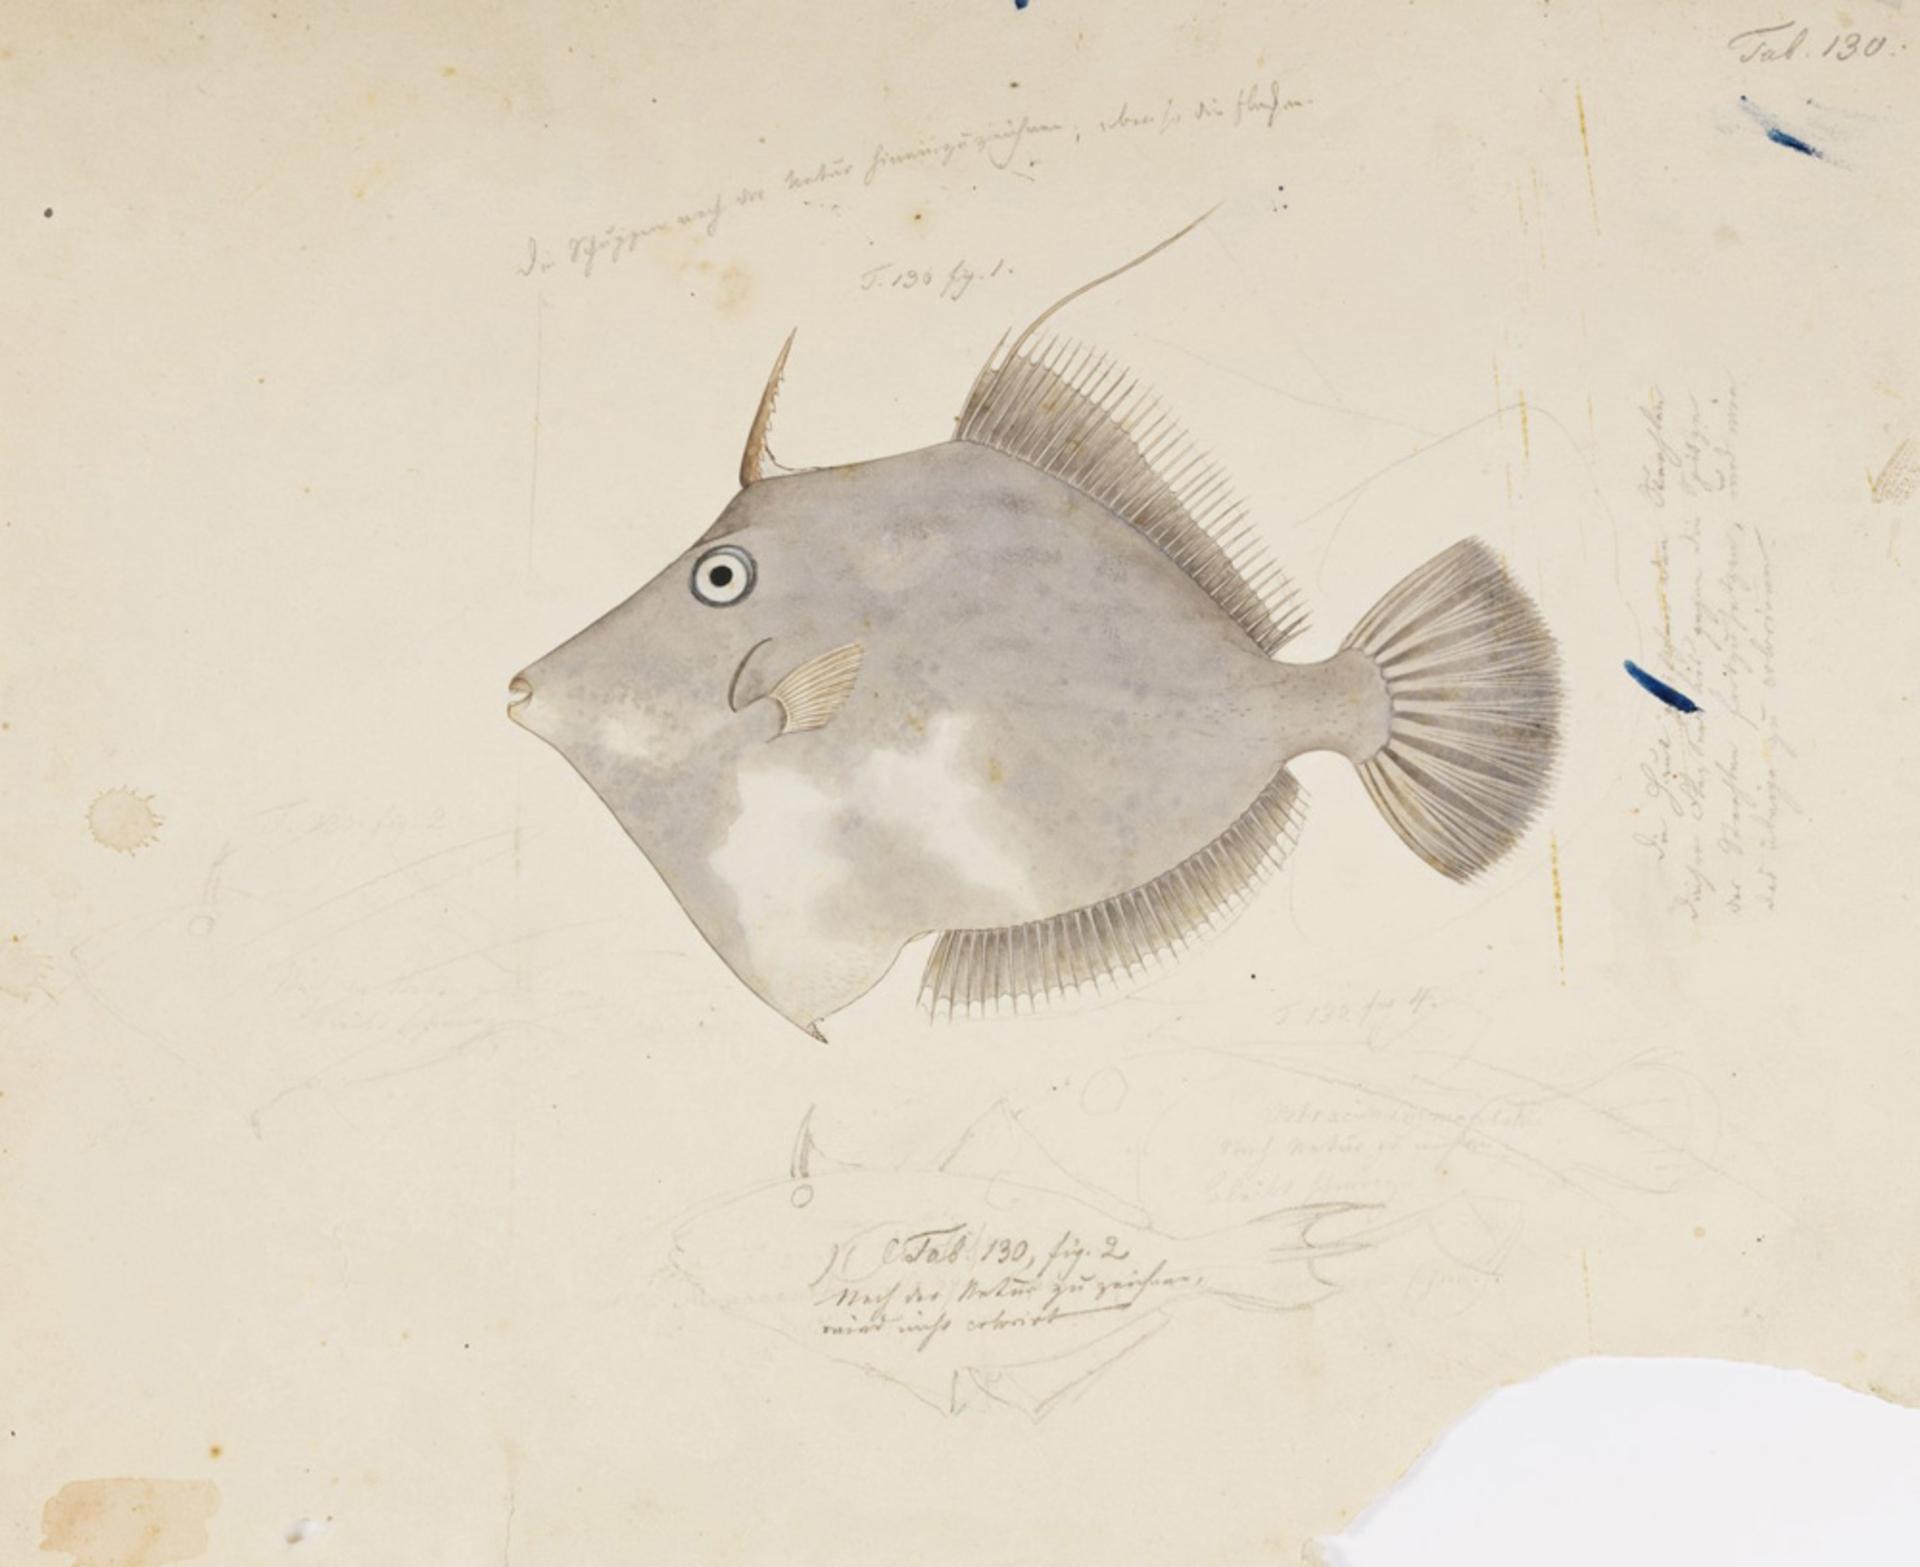 RMNH.ART.181 | Stephanolepis cirrhifer